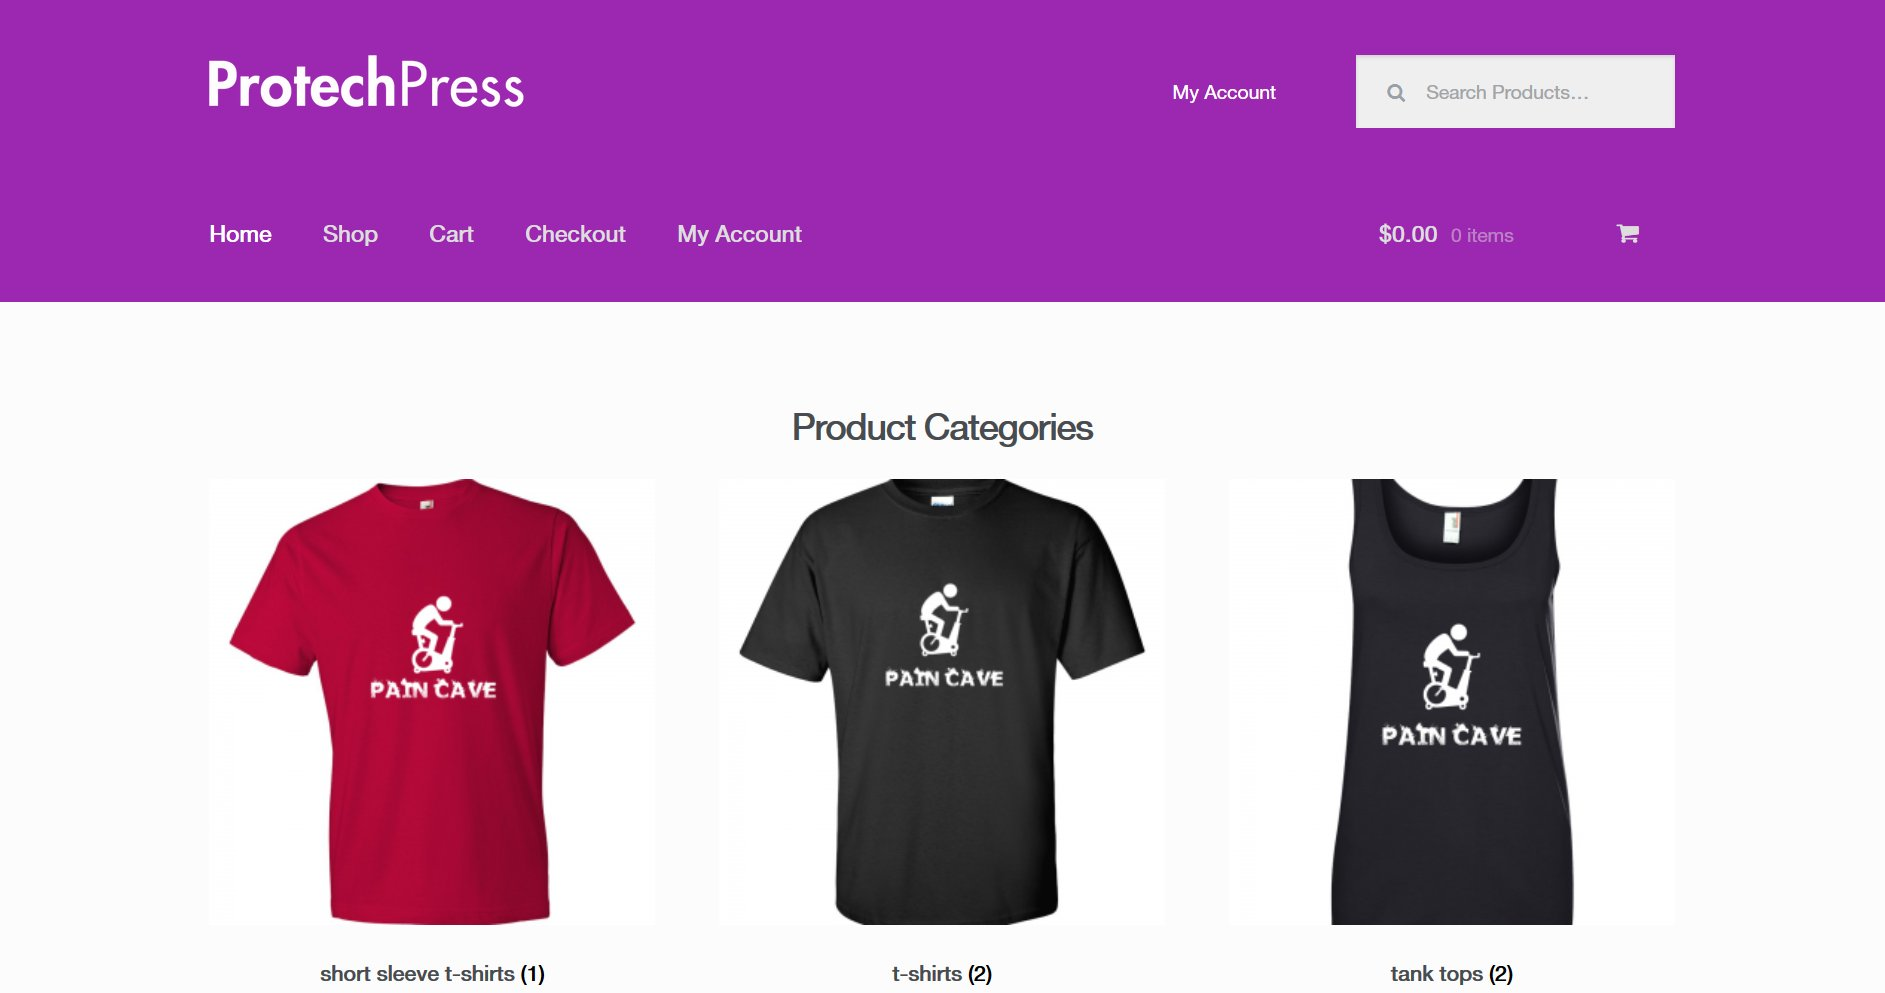 4da86aa2 Build a WooCommerce eCommerce T-Shirt Store with WordPress | Susan Cork |  Skillshare